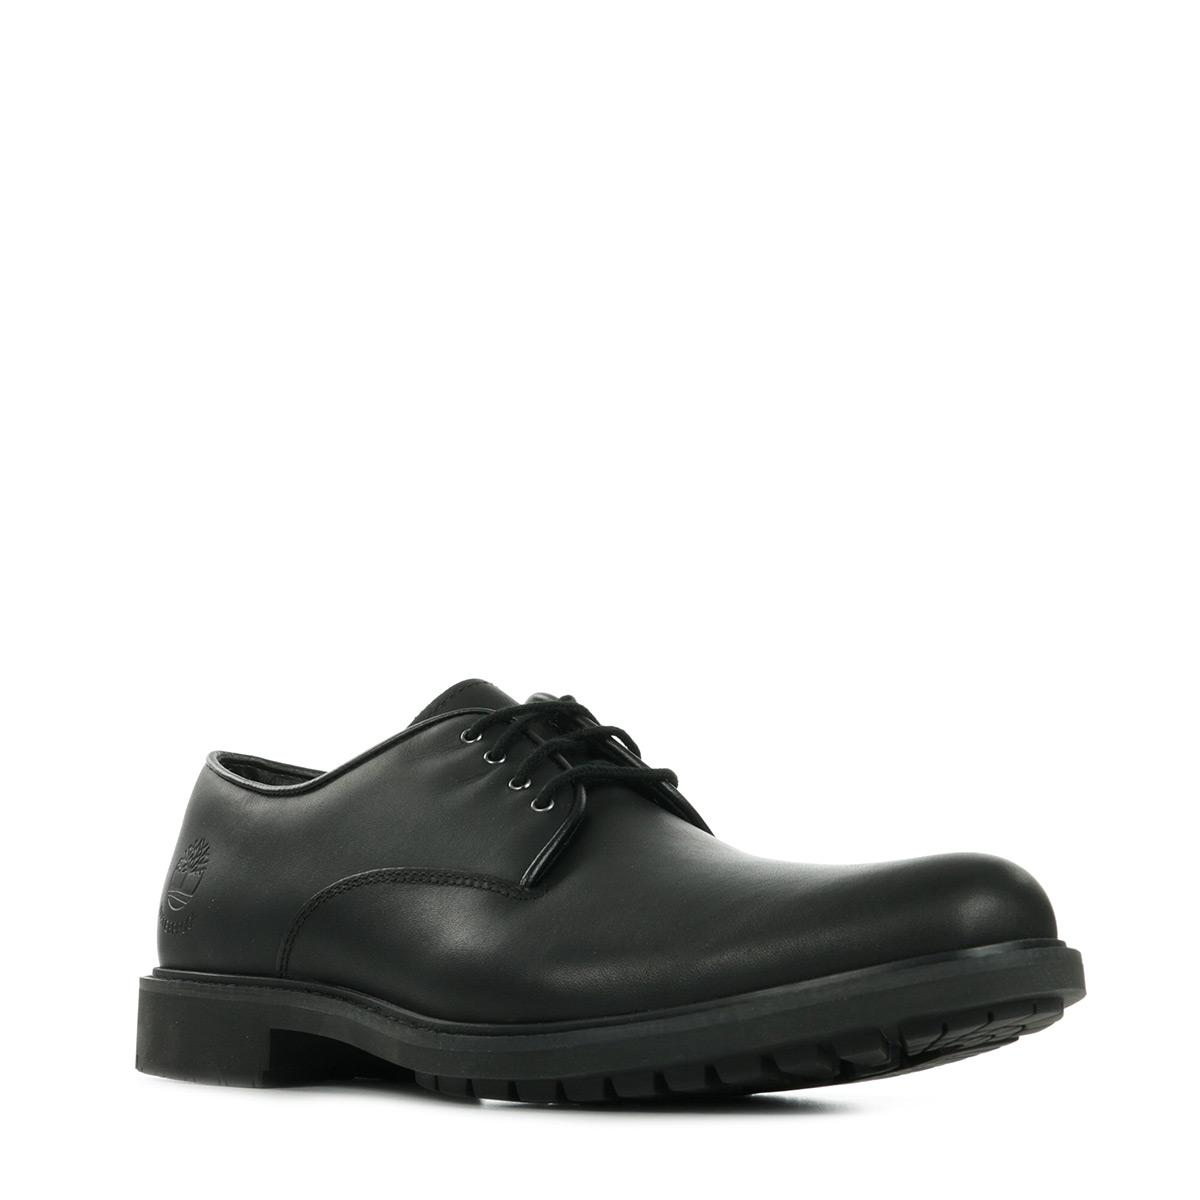 timberland stormbuck waterproof oxford black full grain c5549r chaussures ville homme. Black Bedroom Furniture Sets. Home Design Ideas